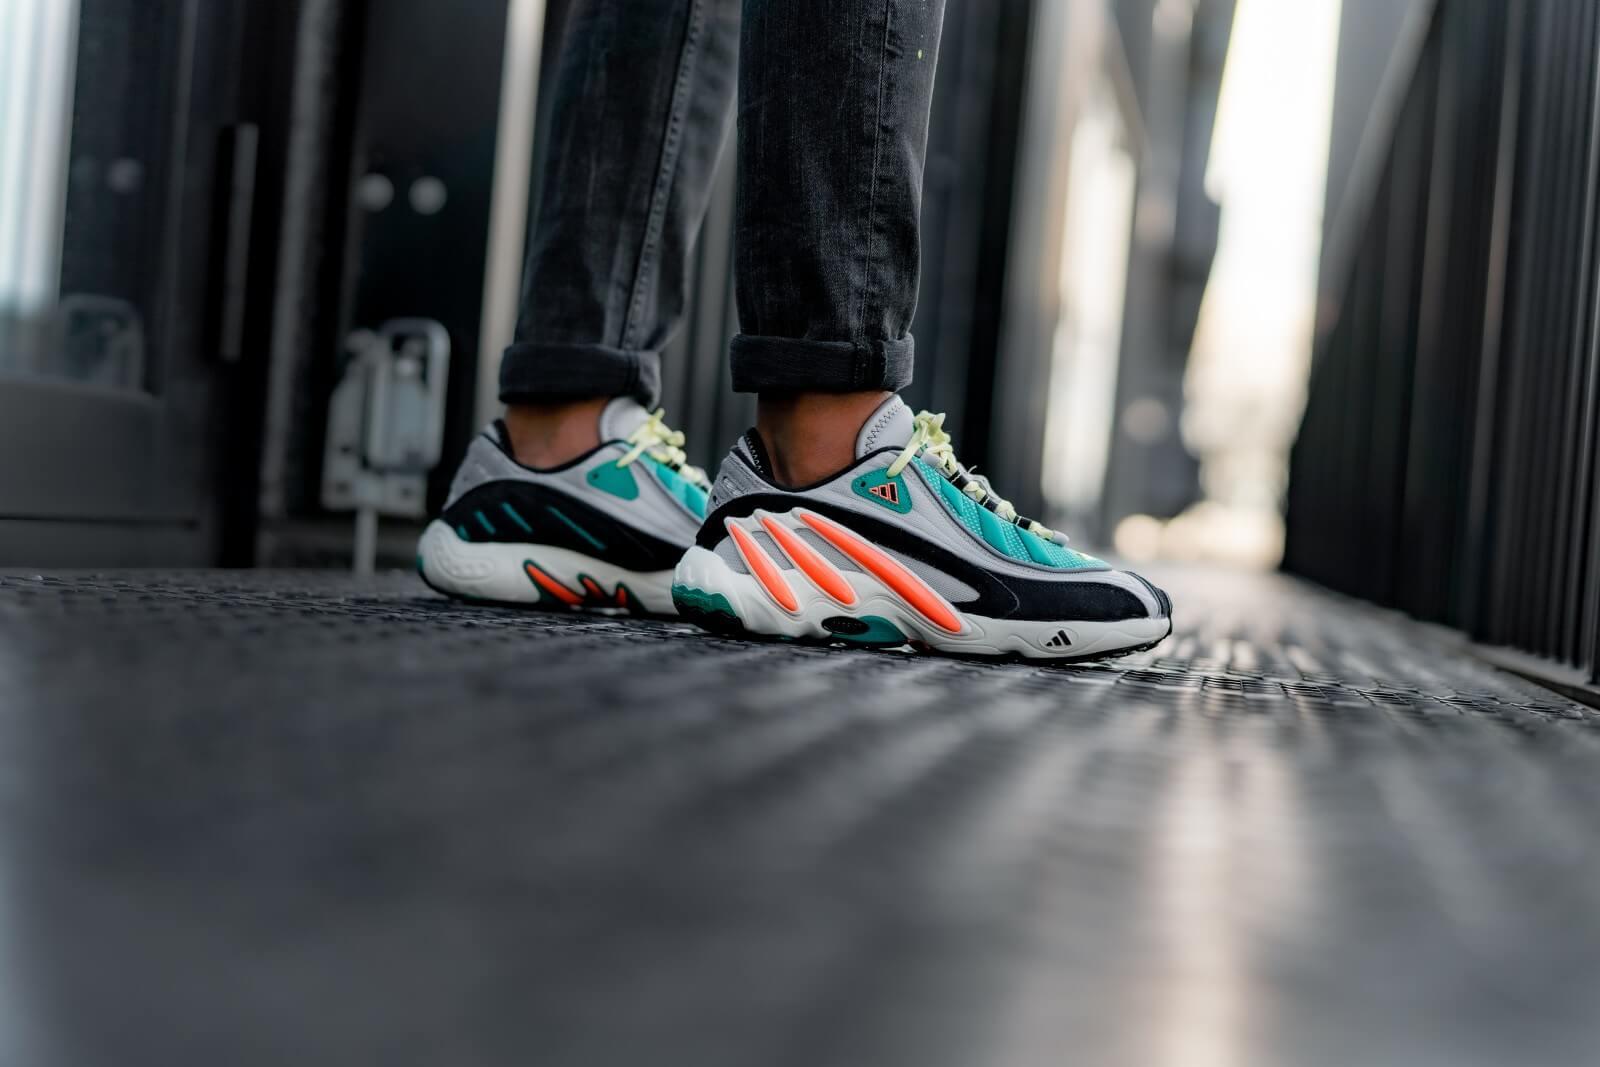 adidas Originals FYW 98 GREY TWO in 2020   New adidas